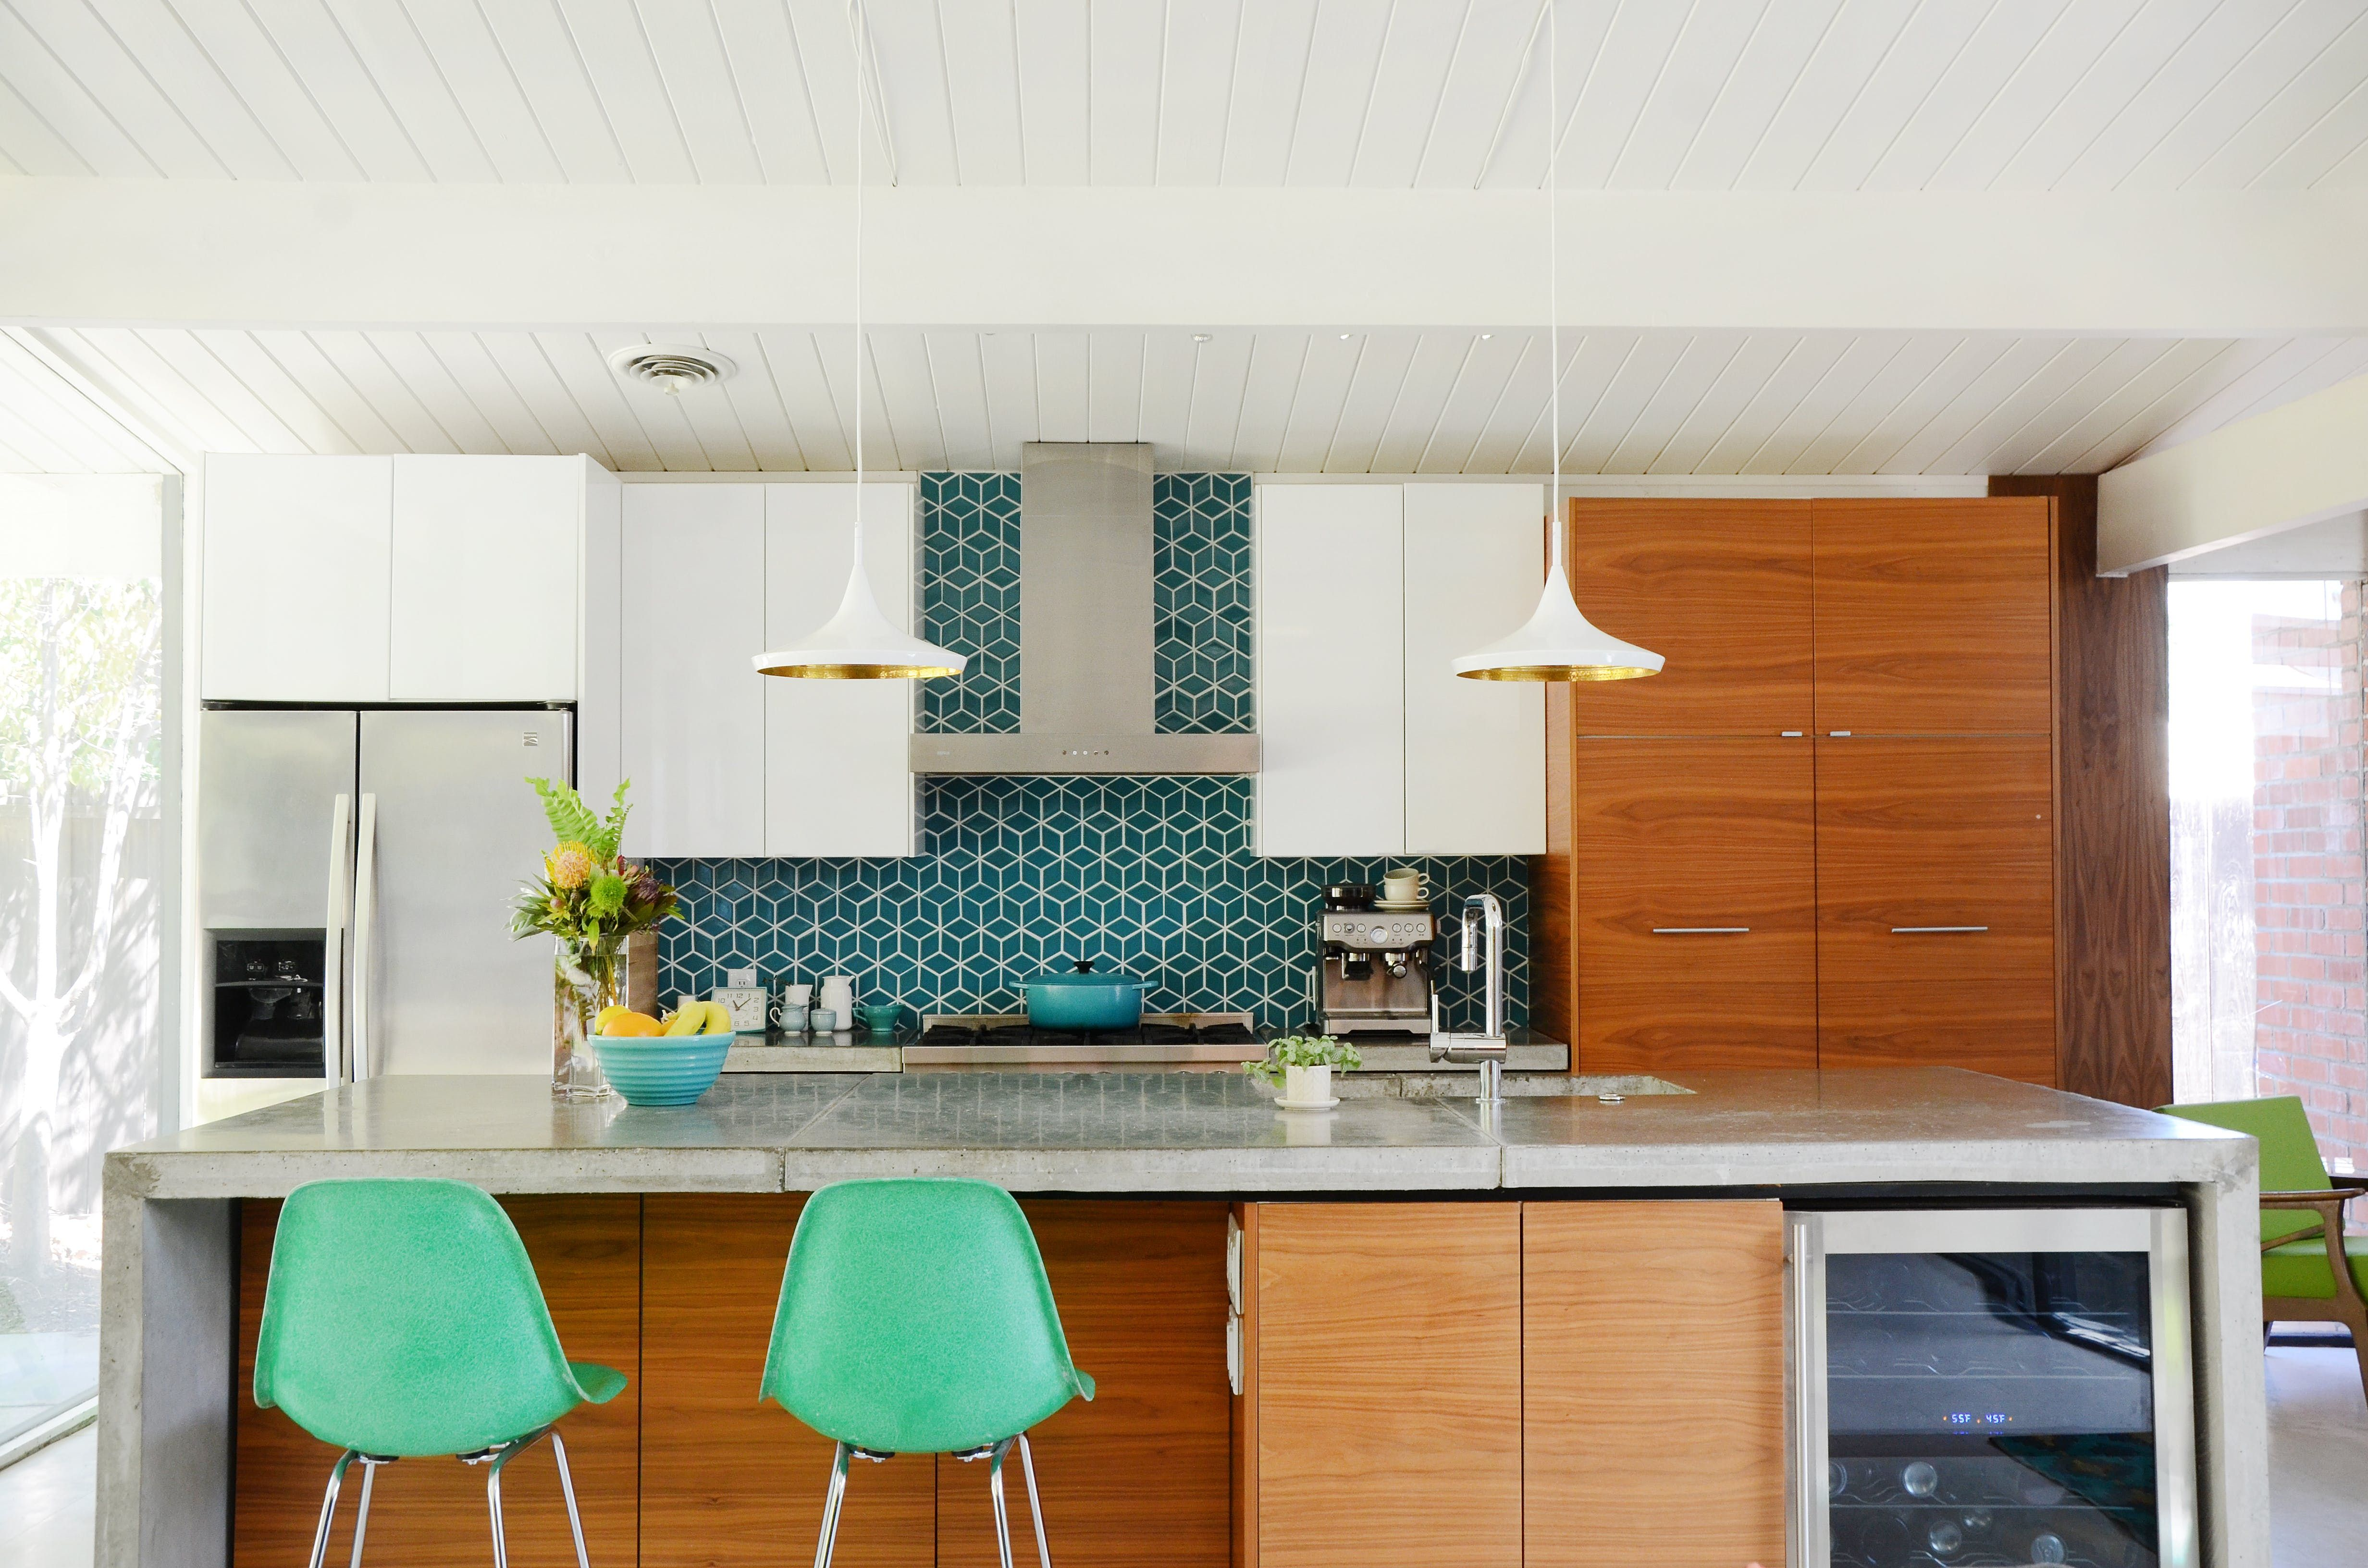 California Kitchen Design Ideas ~ Tour a remodeled eichler home in northern california concrete